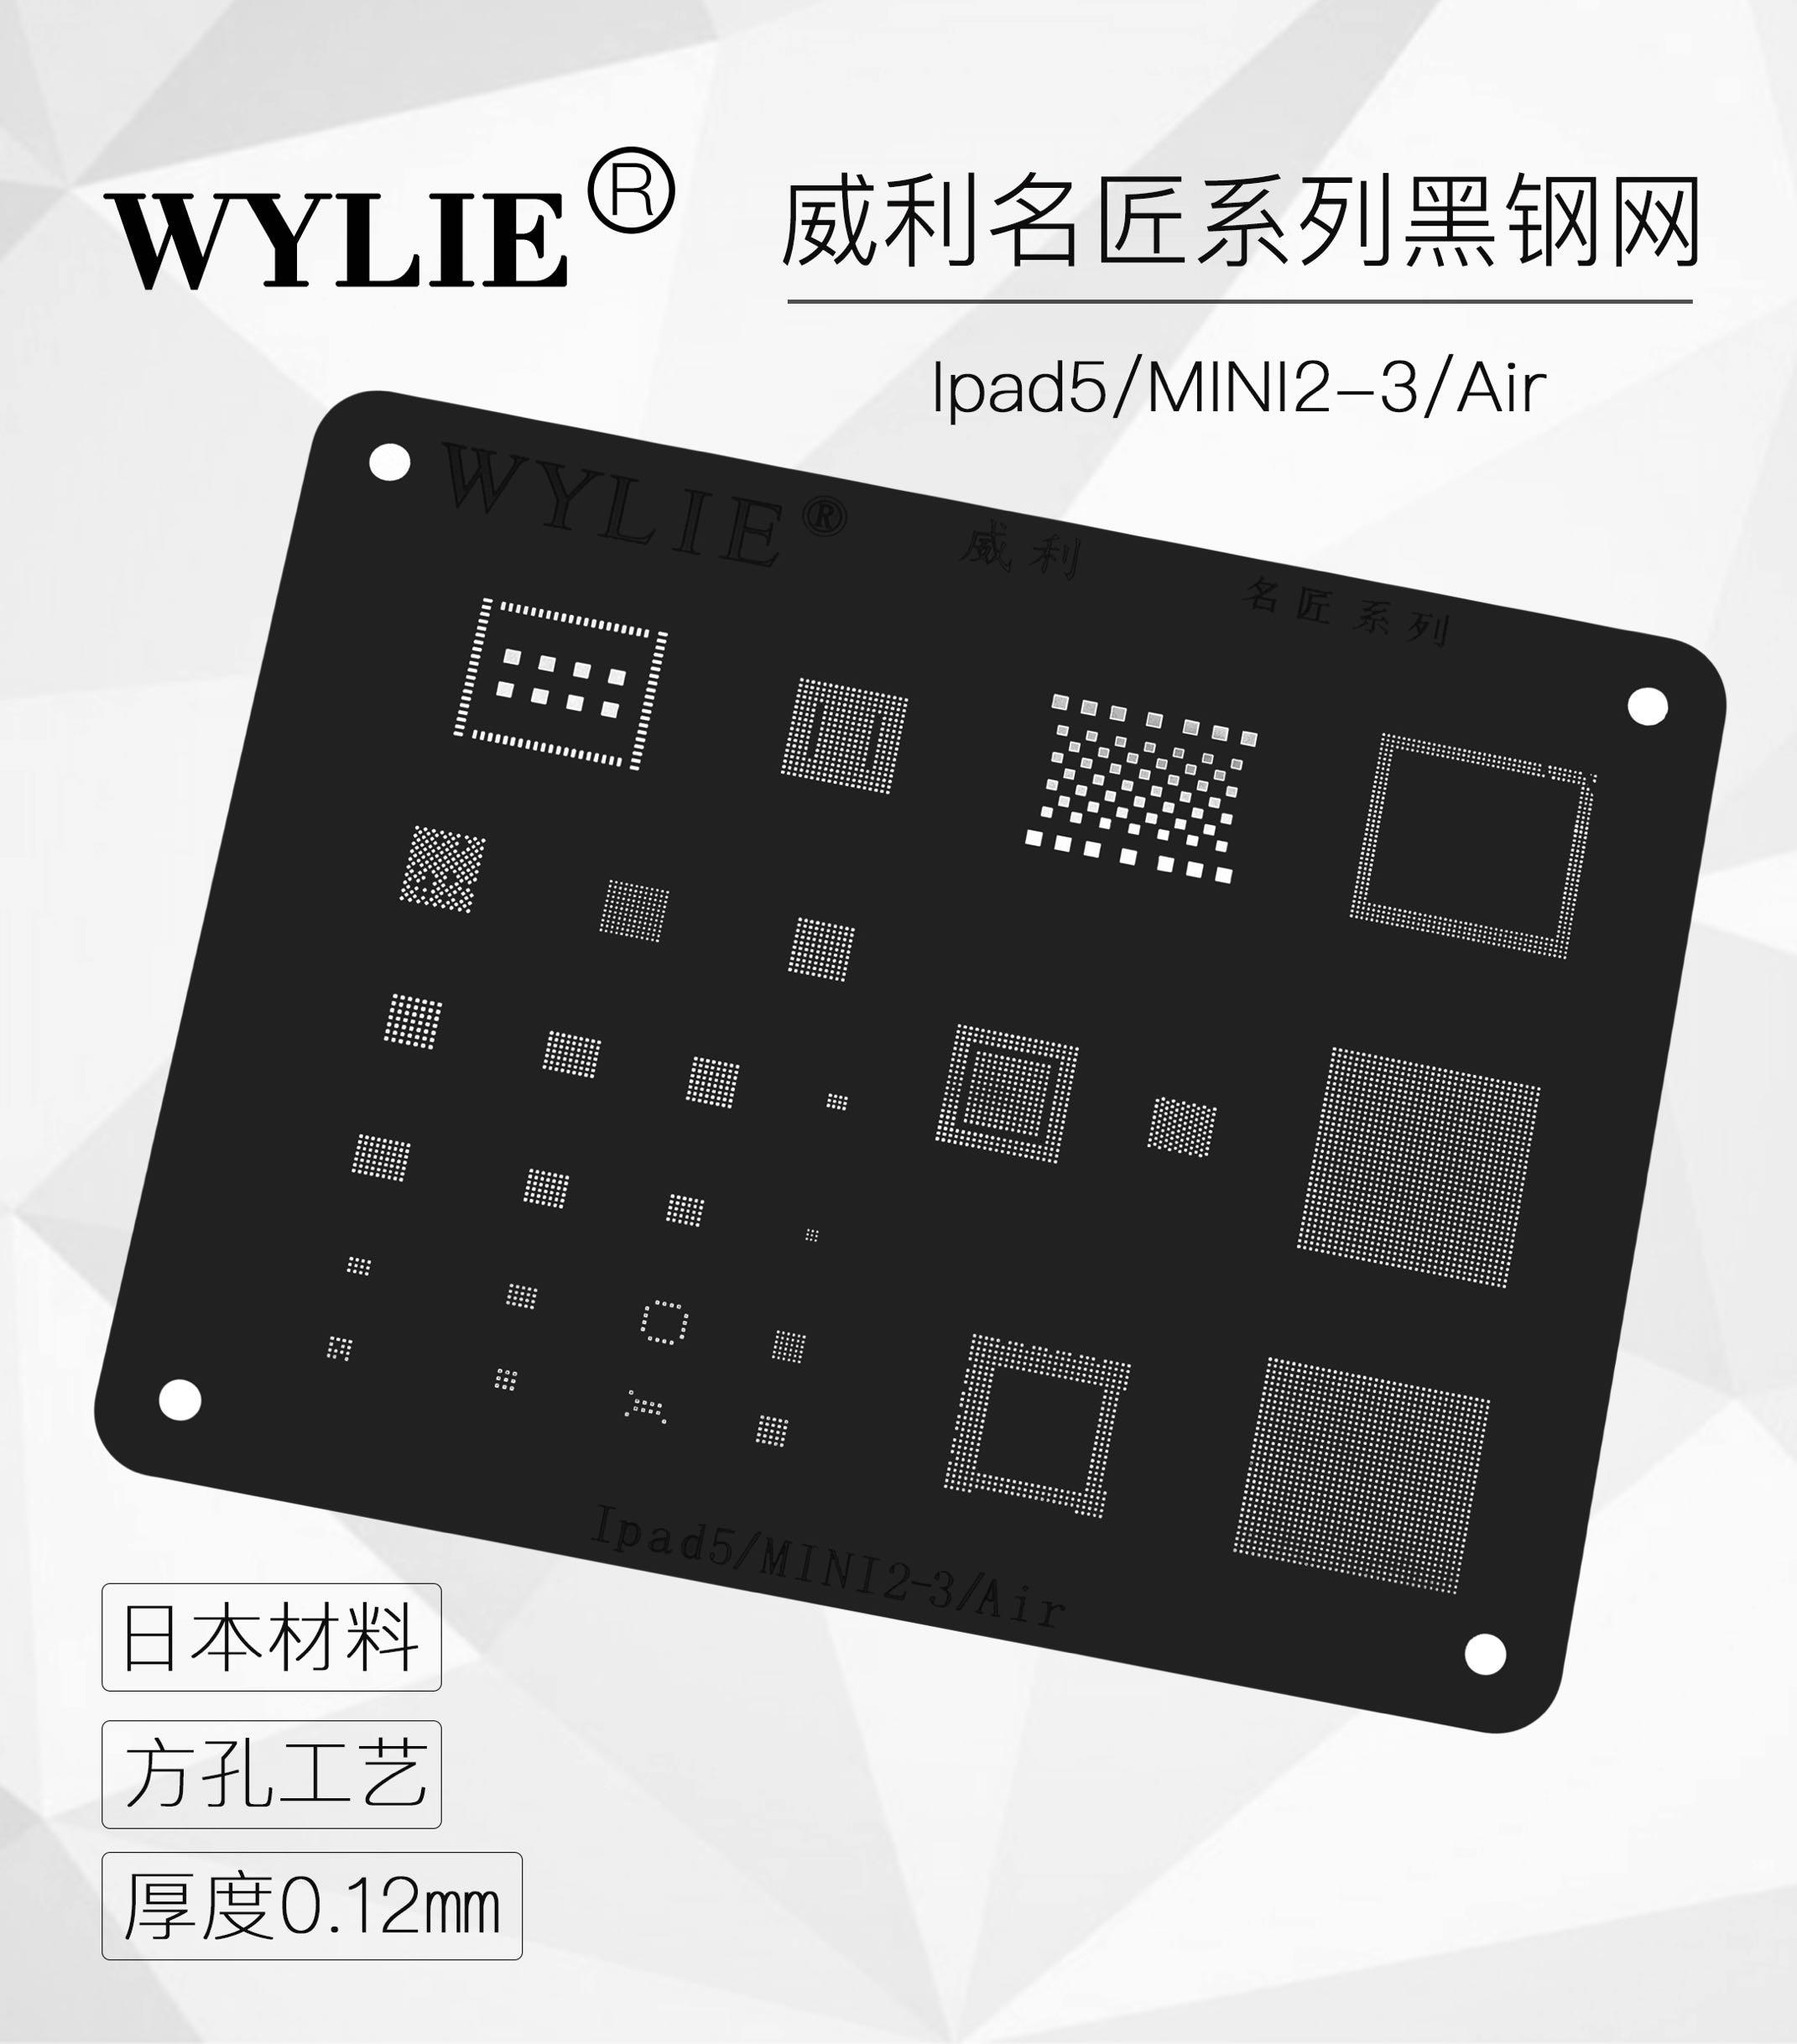 Wylie BGA Reballing Stencil for  ipad 6 Air2 5 Air 4 3 2 mini pro 12.9 10.5 9.7 IC Chip Power U2 NAND PCIE 1